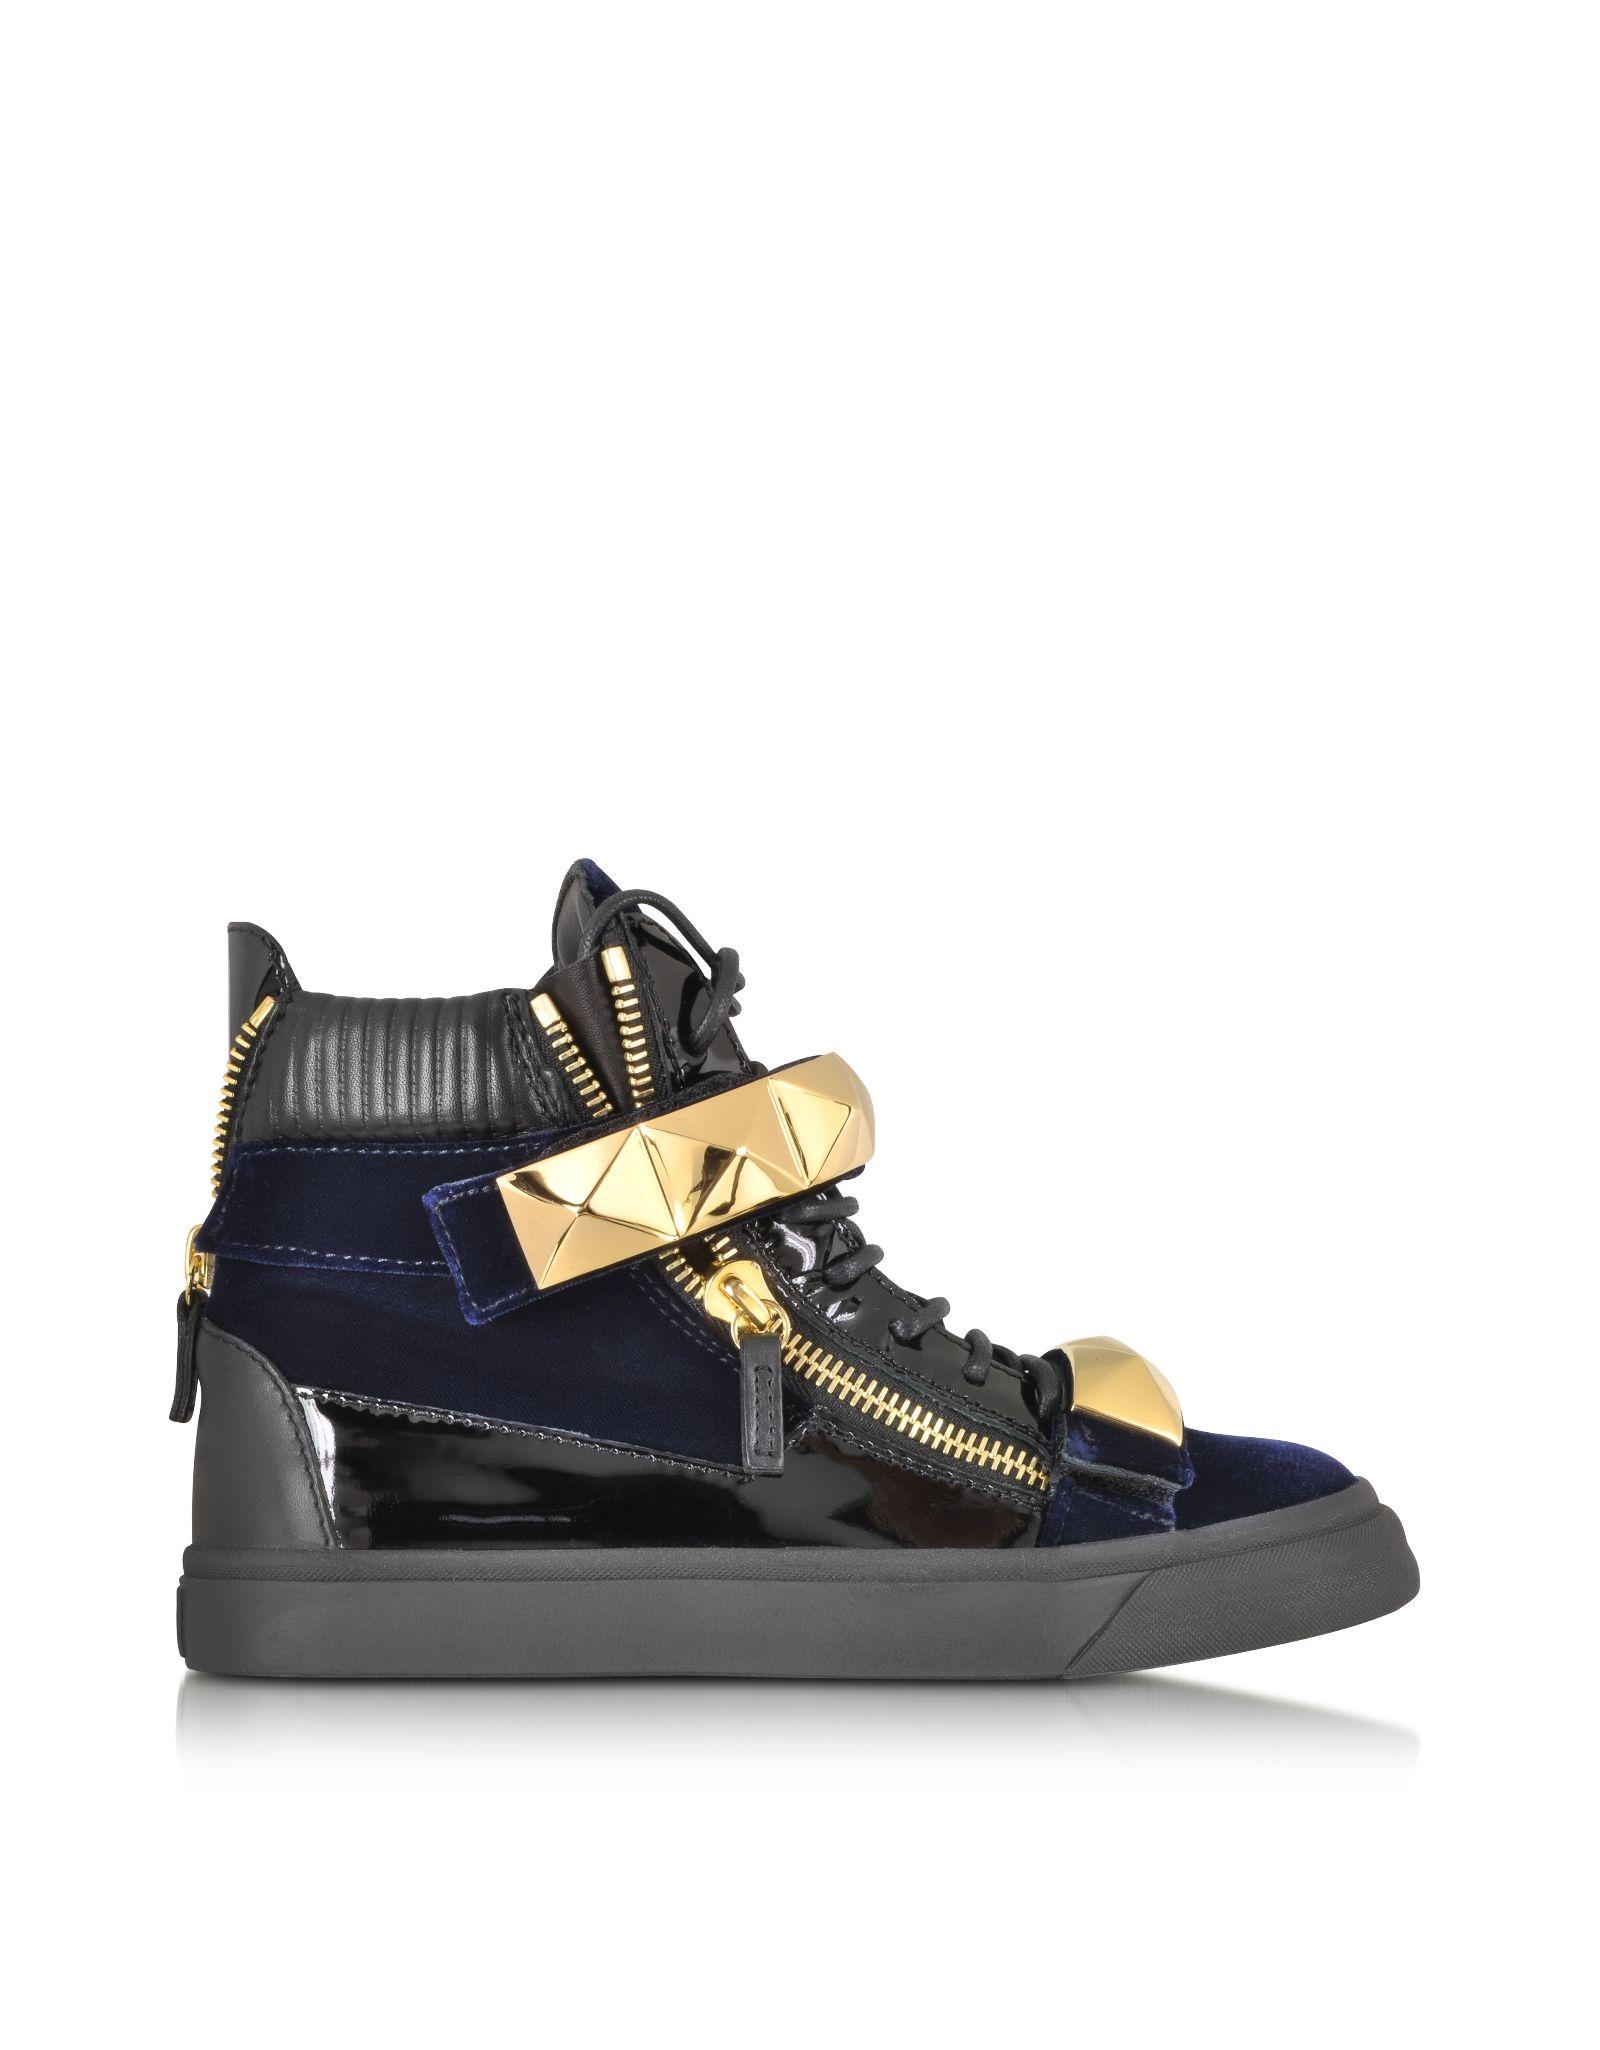 Giuseppe Zanotti London Velvet Veronica Navy High-Top Sneaker at FORZIERI